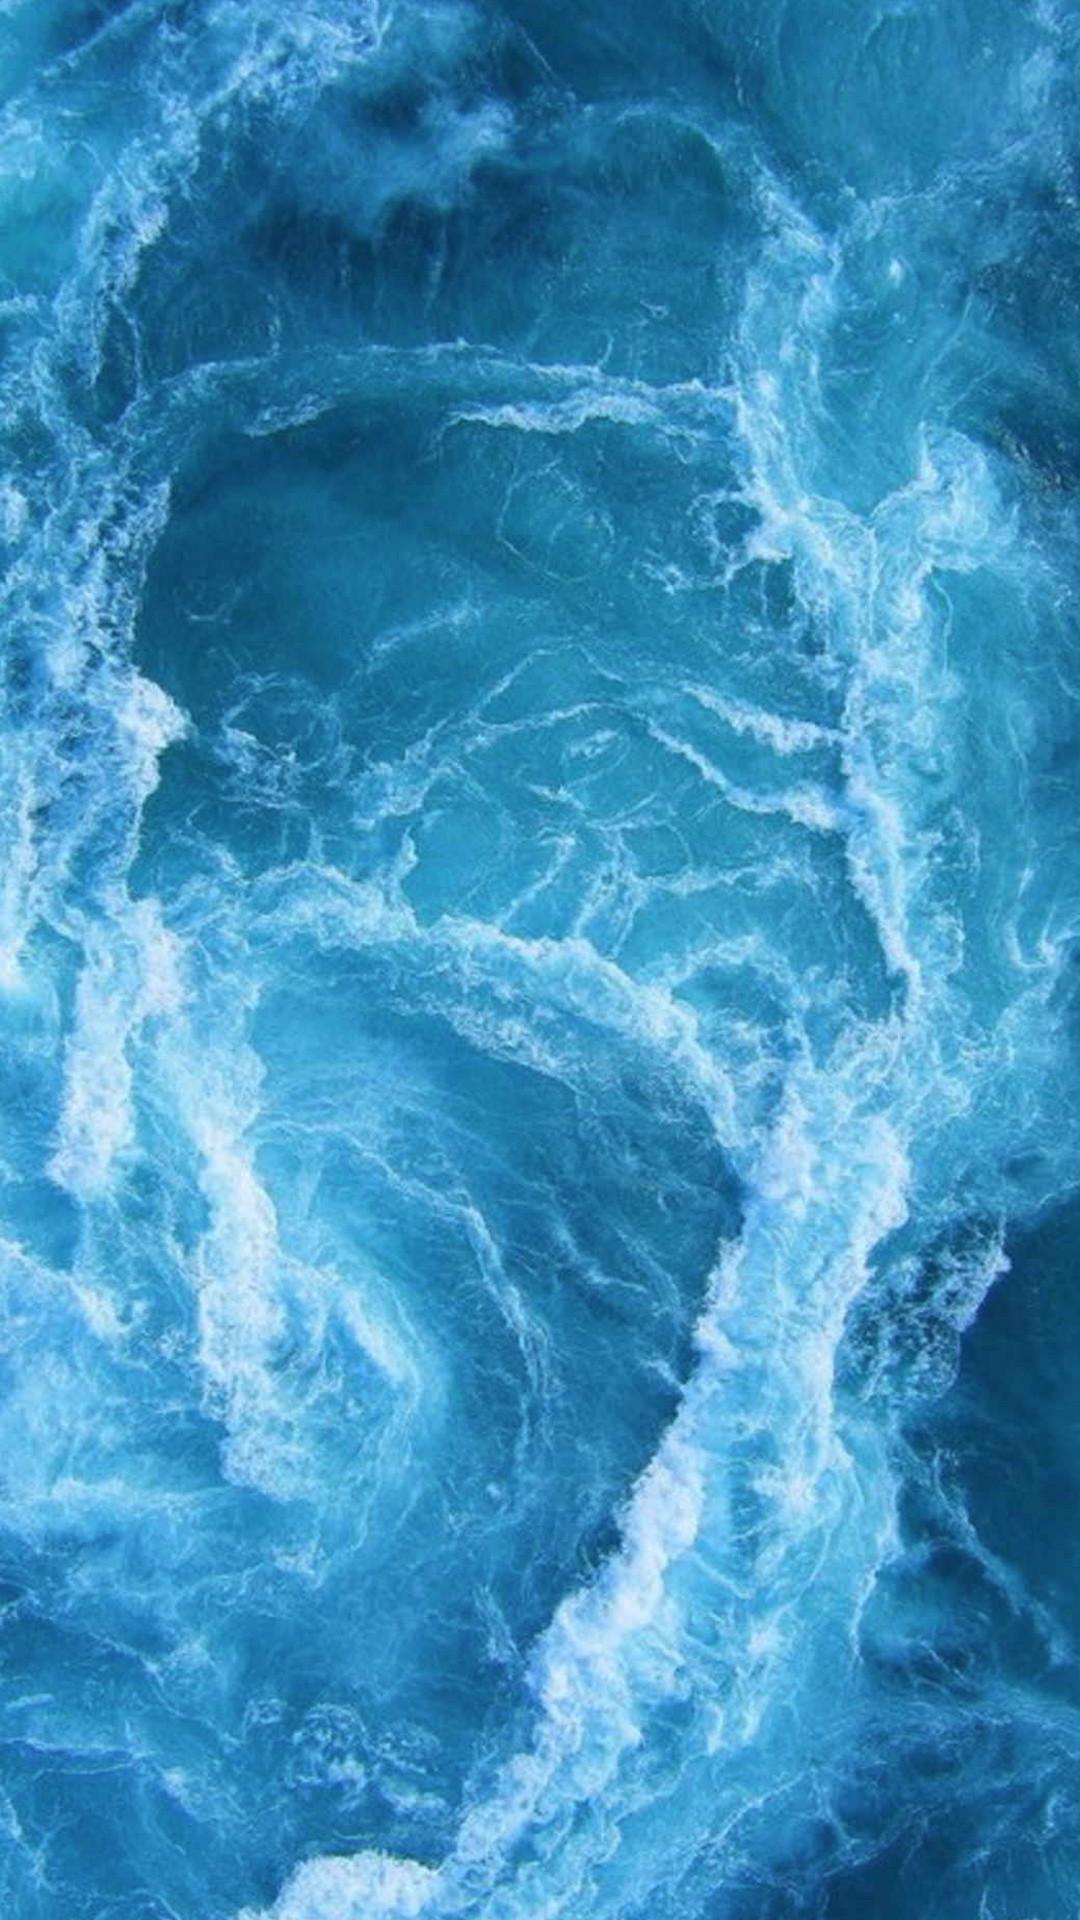 ocean water wallpaper 63 images